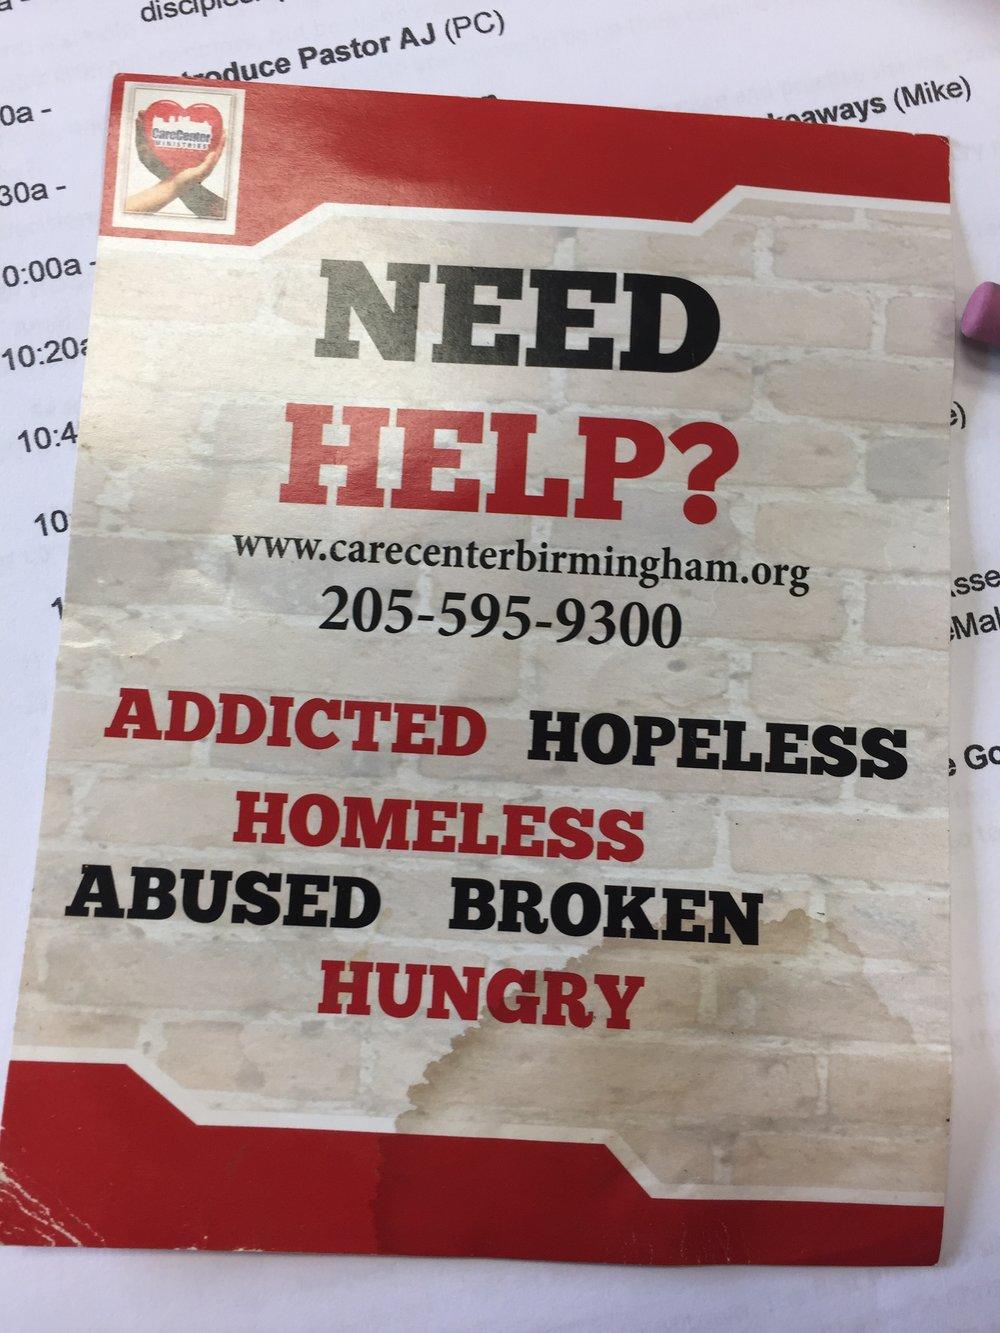 Pastor AJ's handout to the homeless.